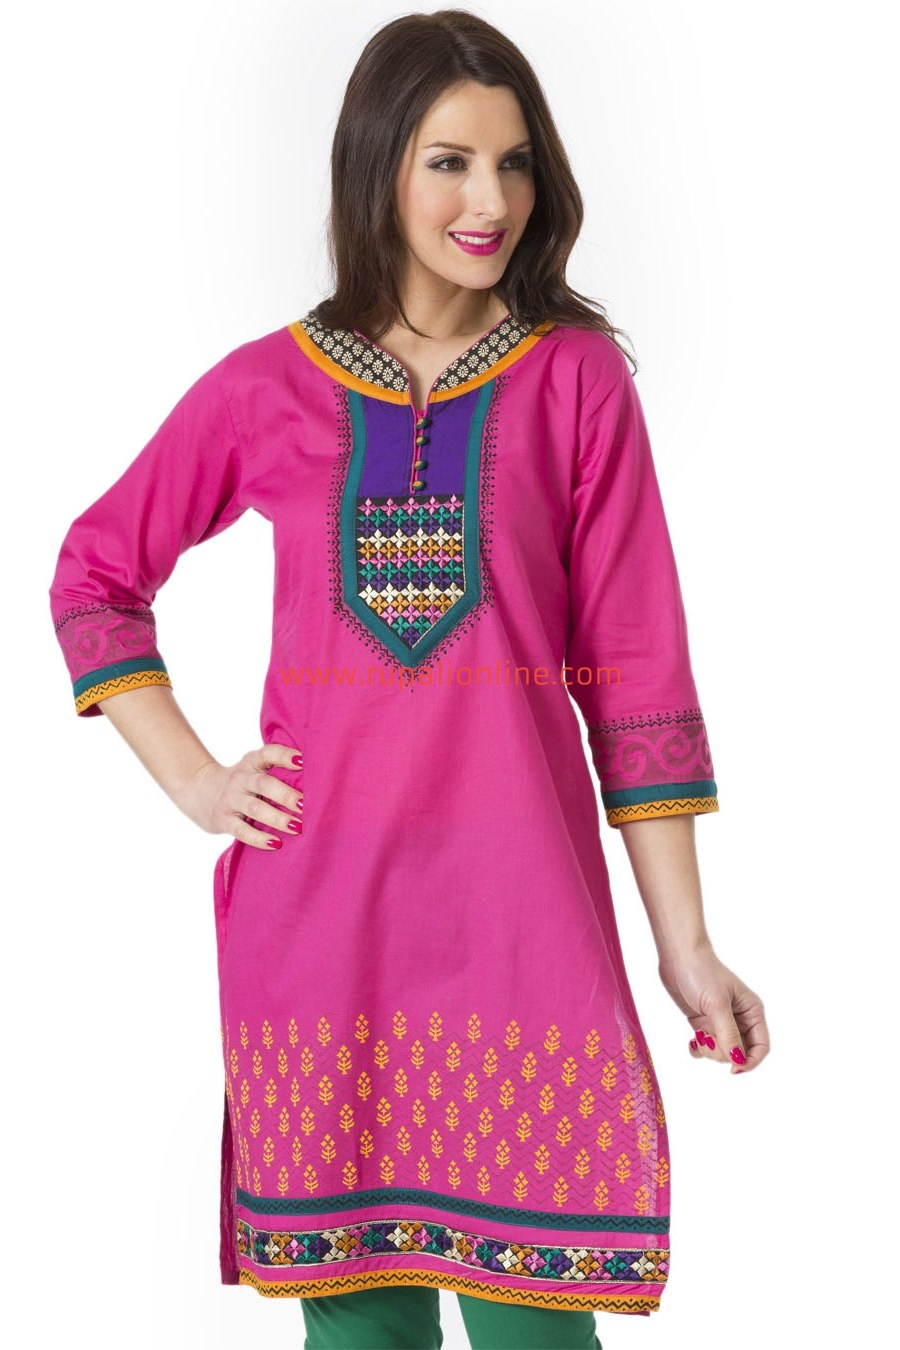 56744d538 Buy an excelent range of Asian Womens kurtis, Salwar Kameez, Churidar and  Trouser Suits. Kaftans, Bridal Saree, Asian womens Clothes from rupali ...